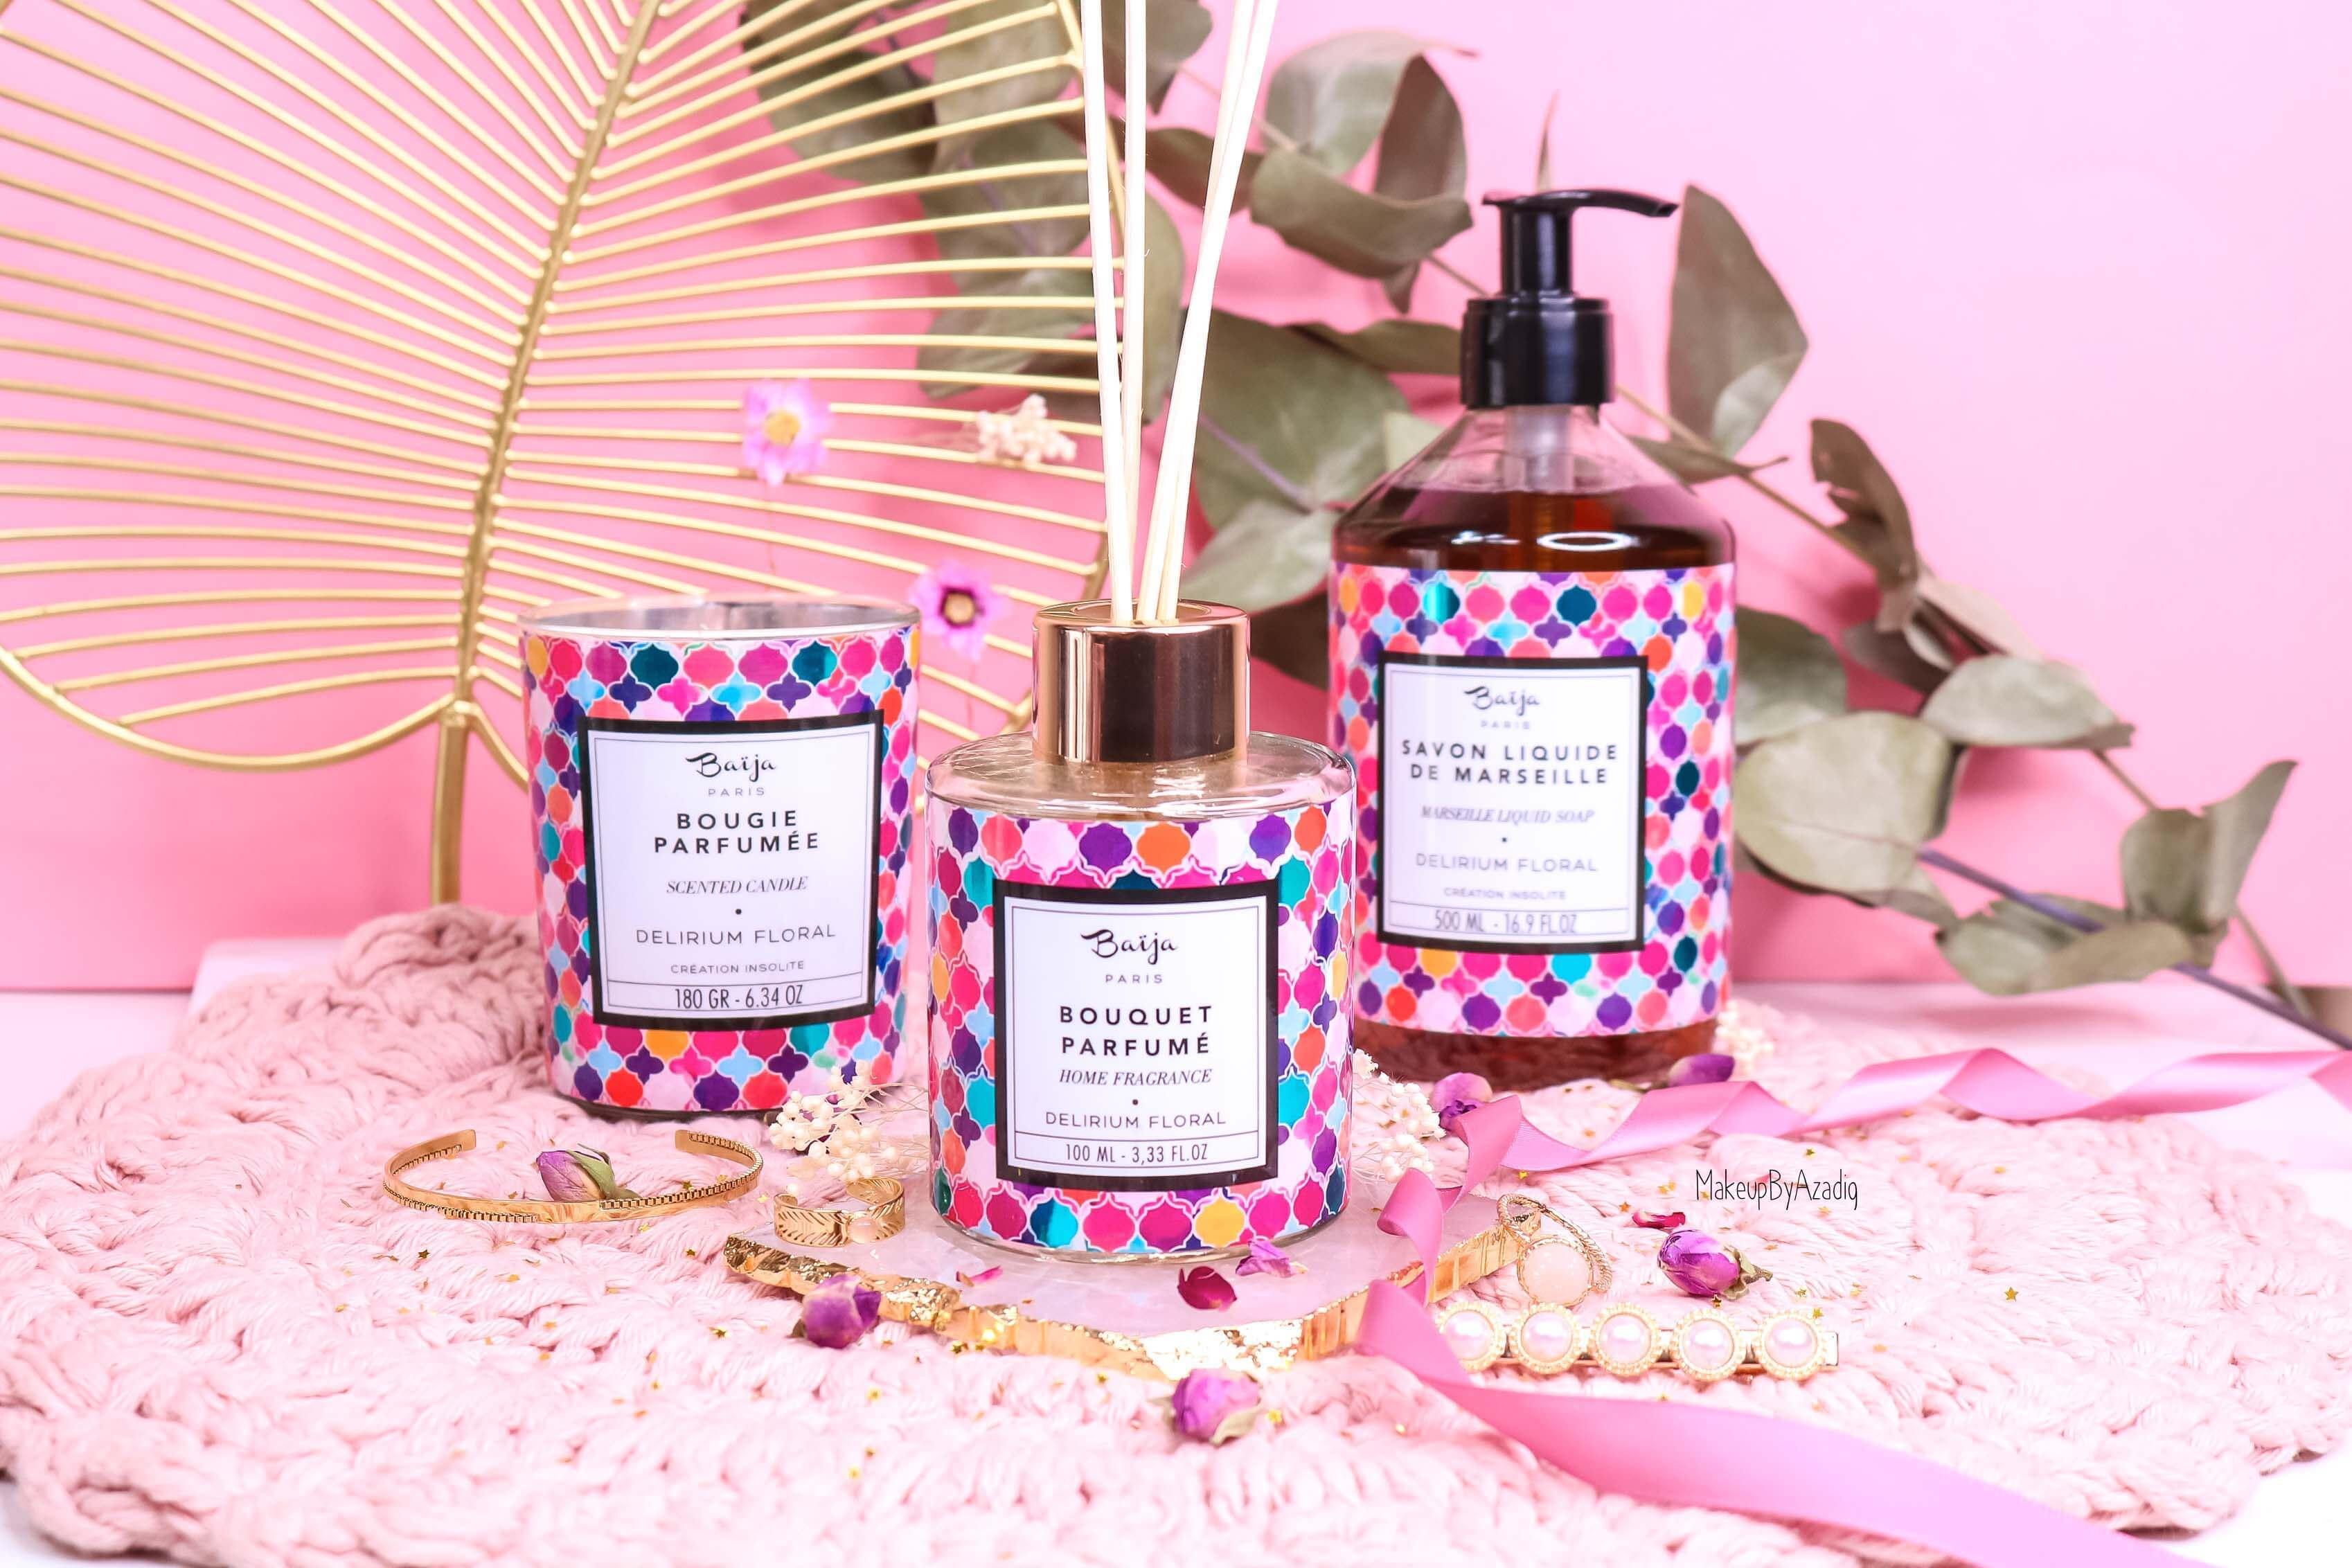 revue-collection-delirium-floral-baija-paris-corps-bougie-gommage-soin-fleurs-makeupbyazadig-avis-prix-sephora-miniature